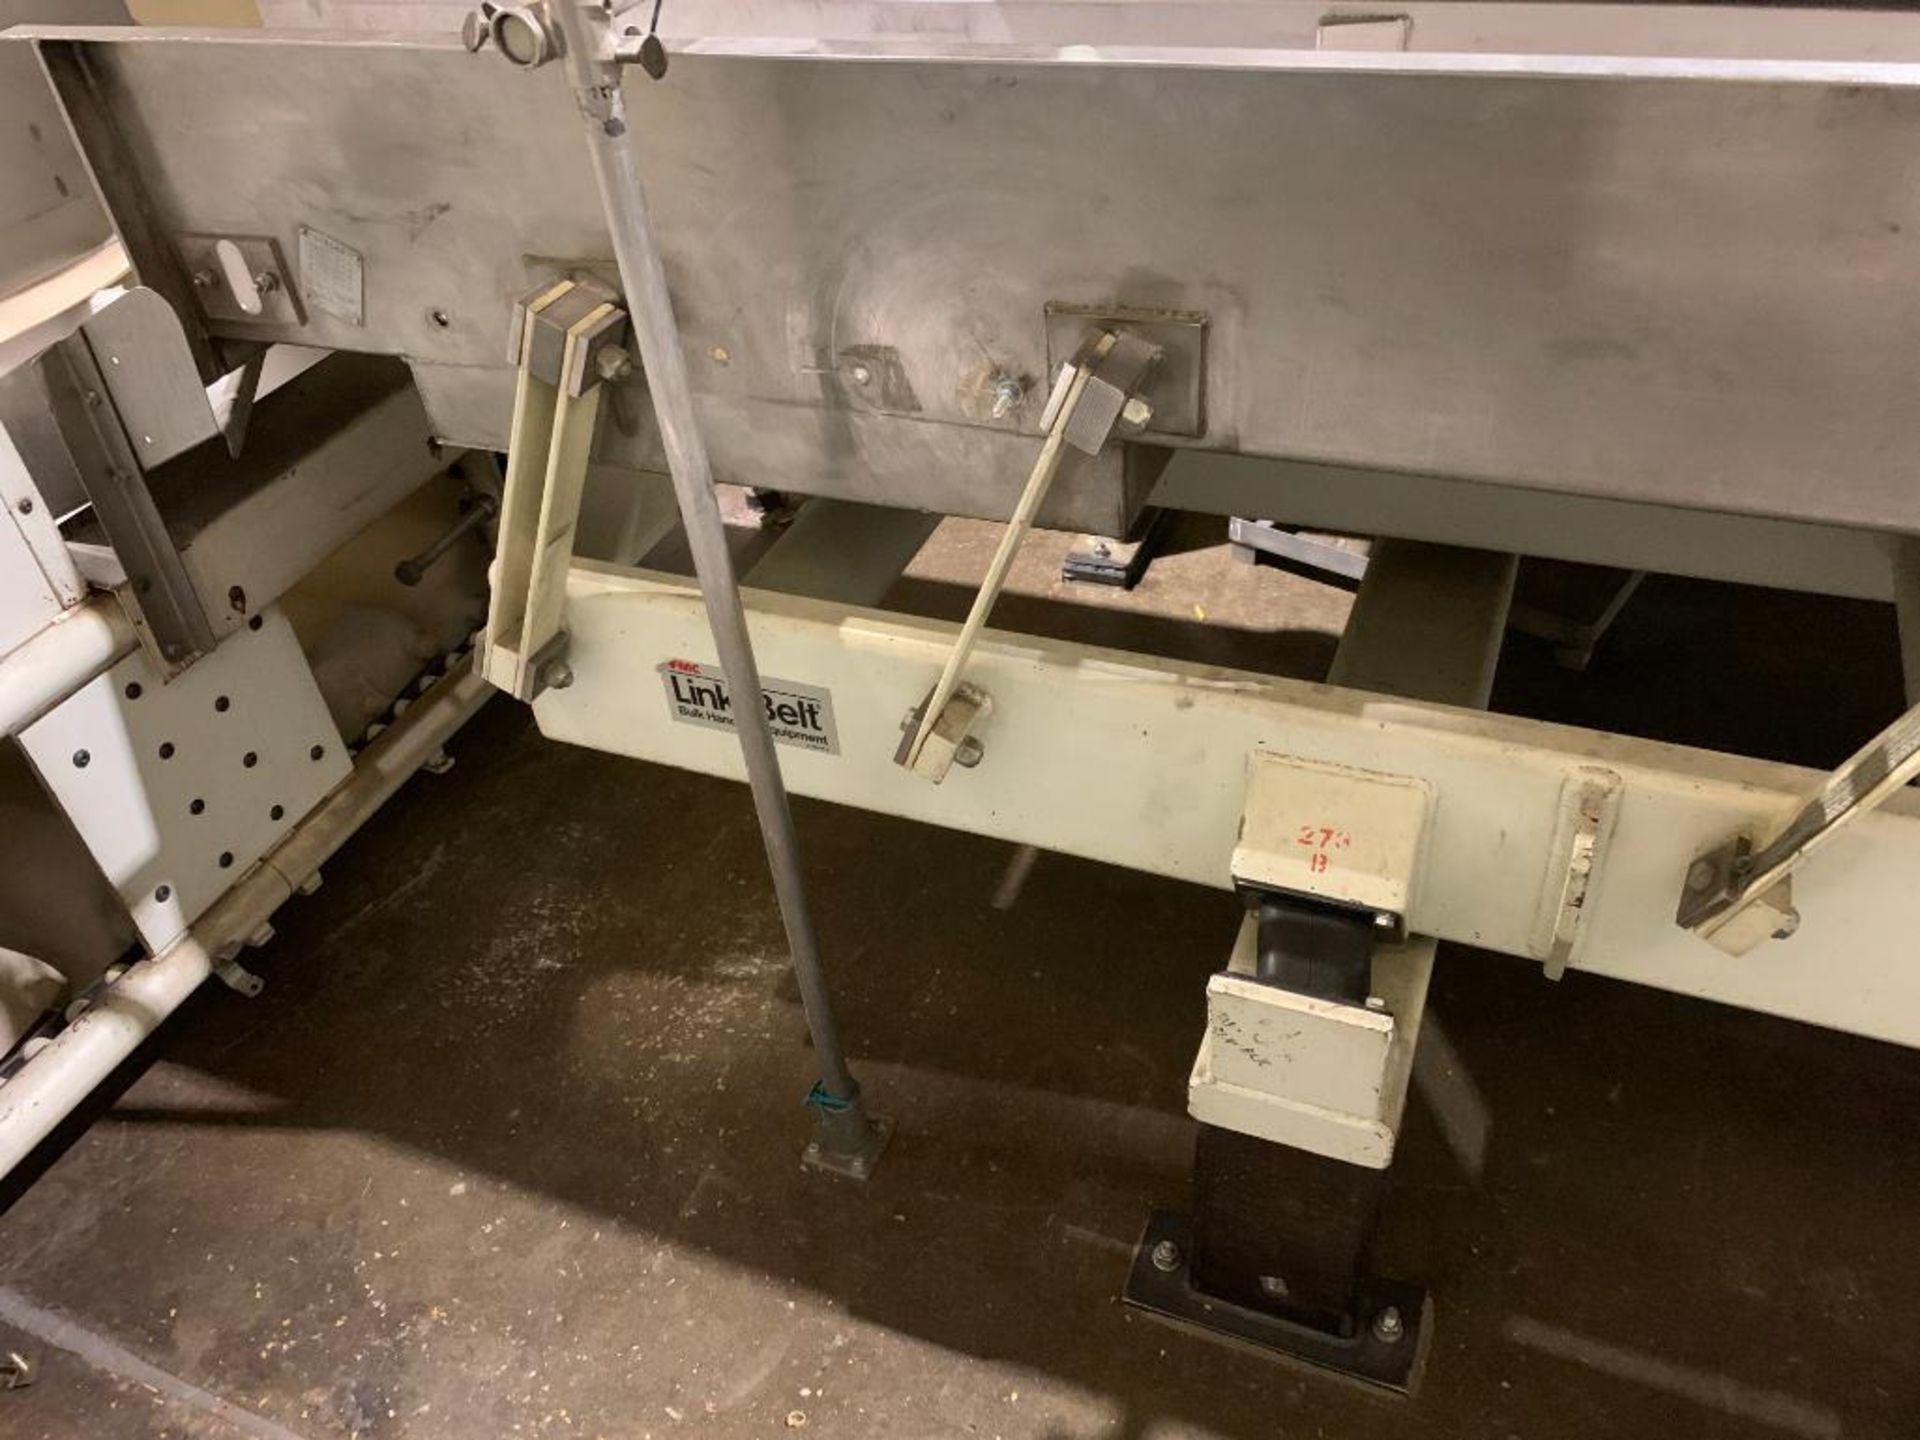 1992 Link-Belt vibratory conveyor, model LBL2405-10X12-10 - Image 5 of 34